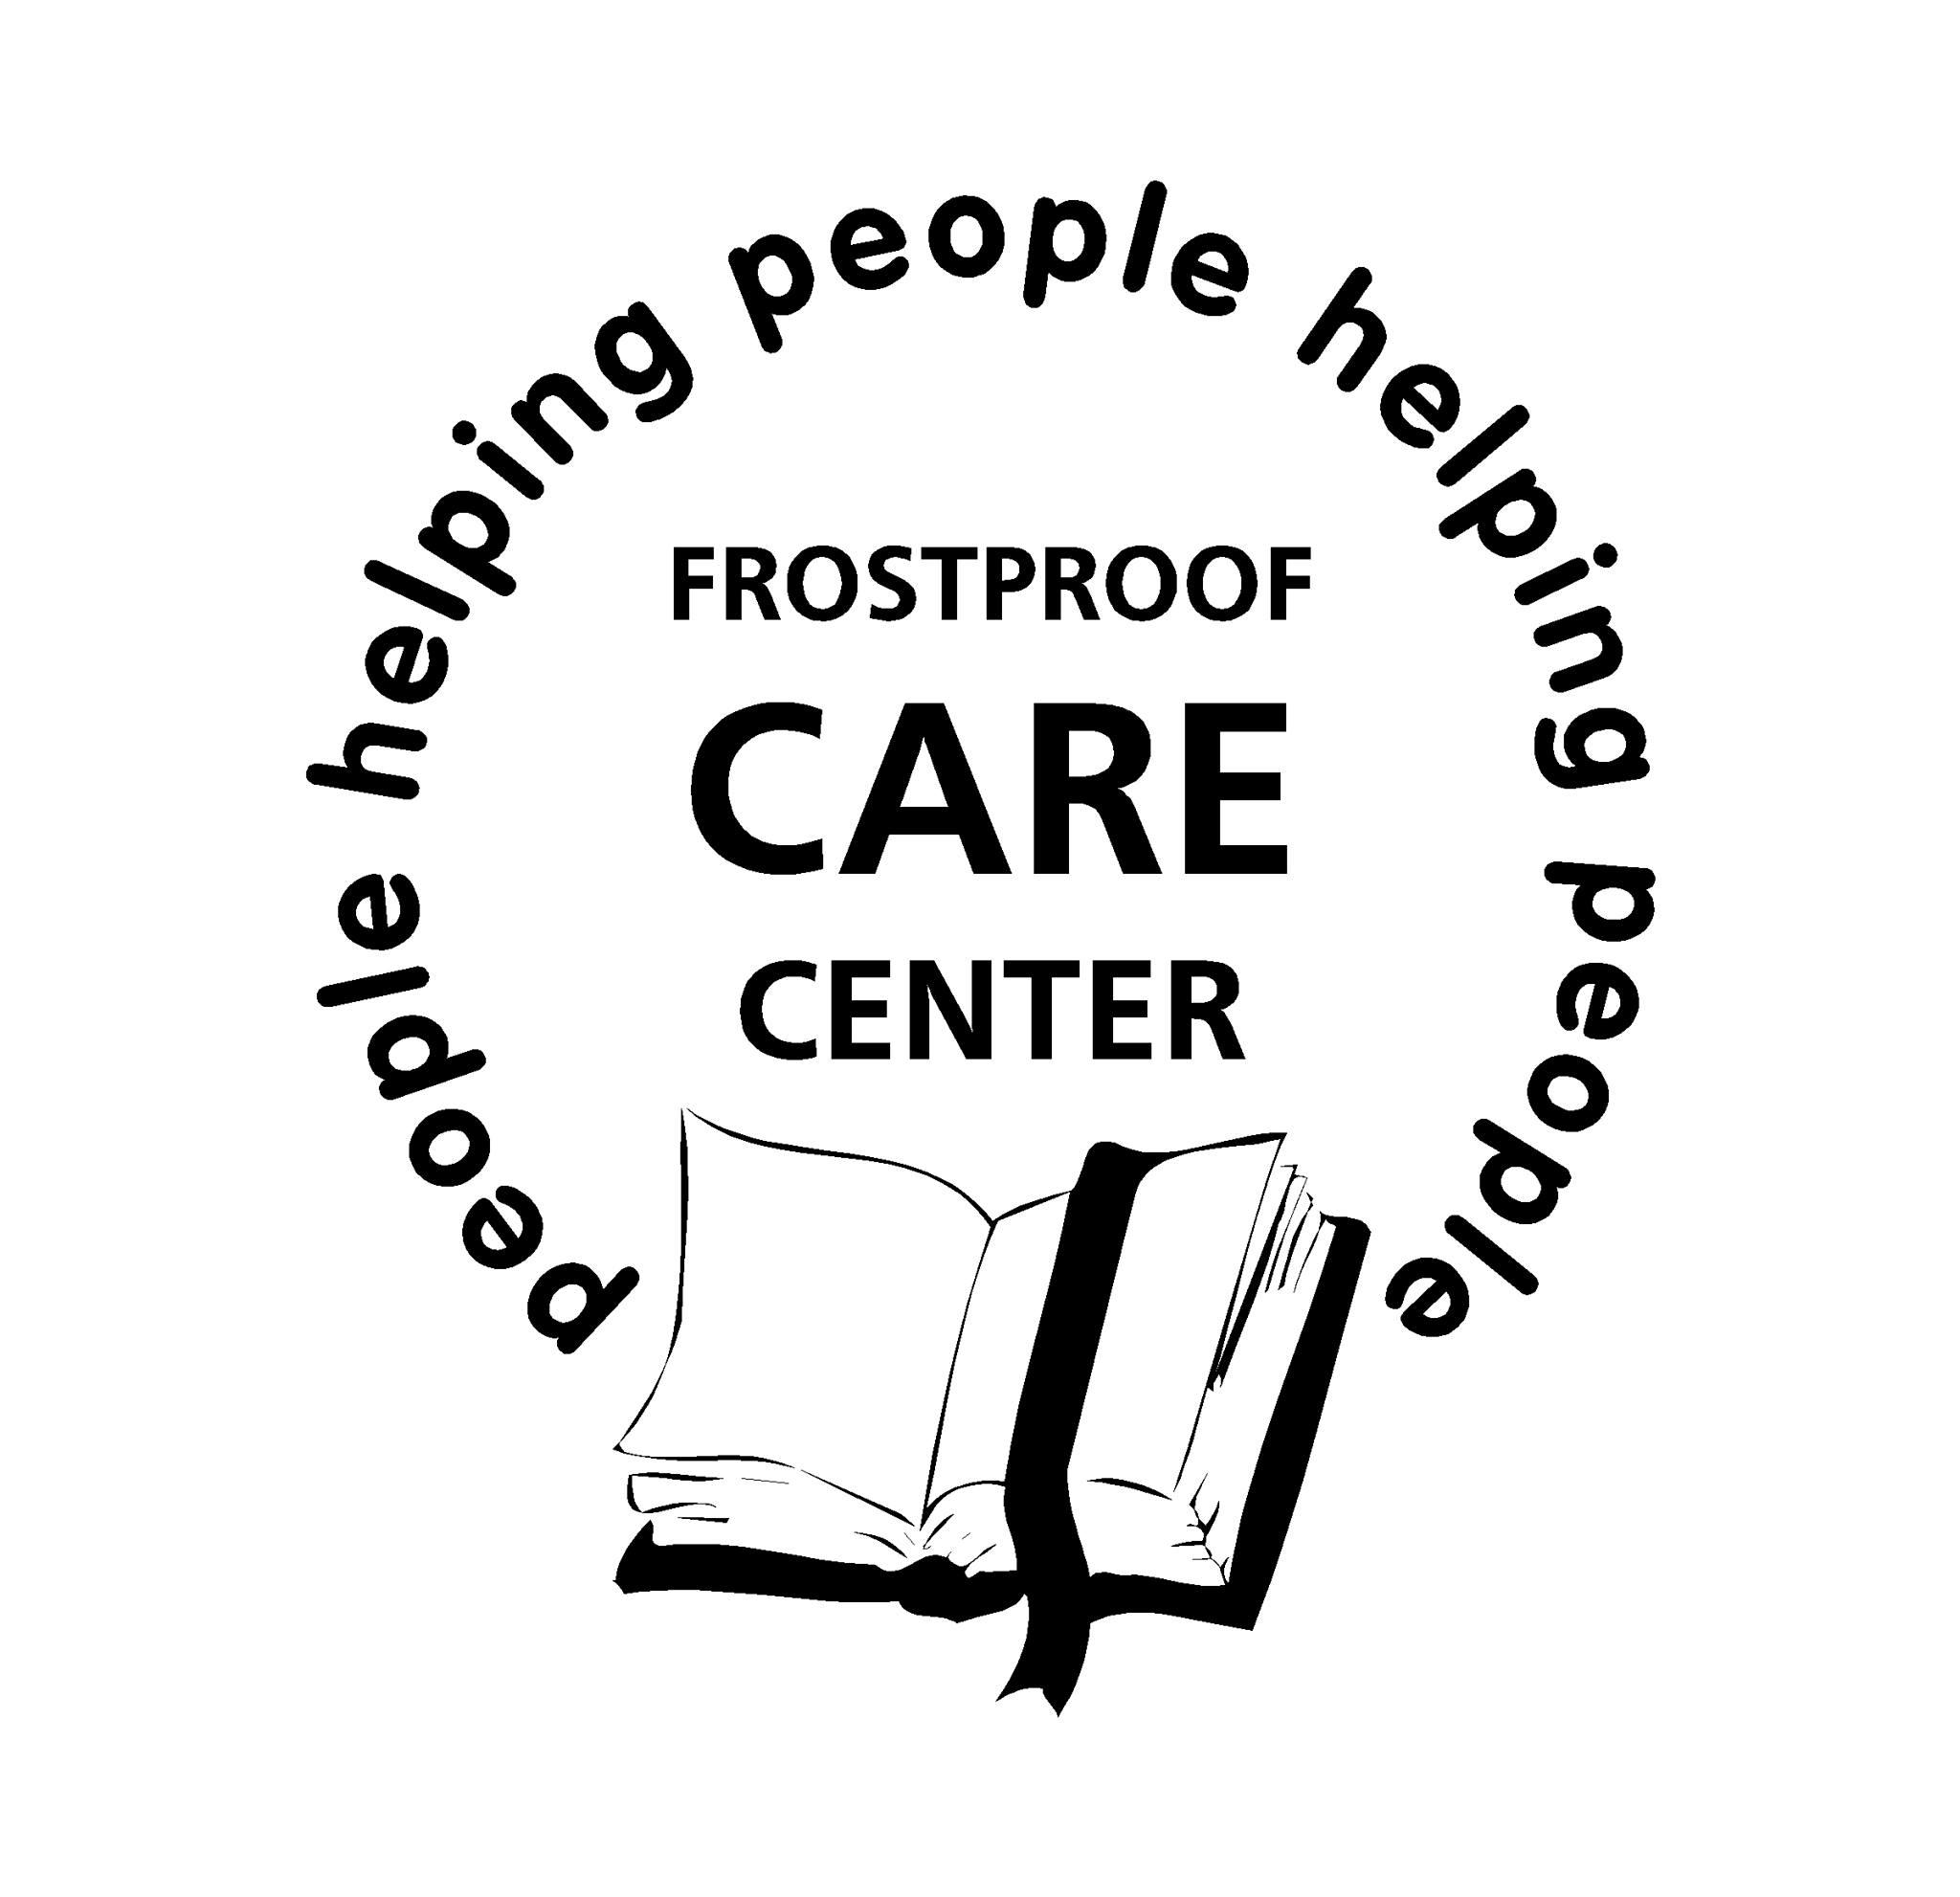 Frostproof Care Center